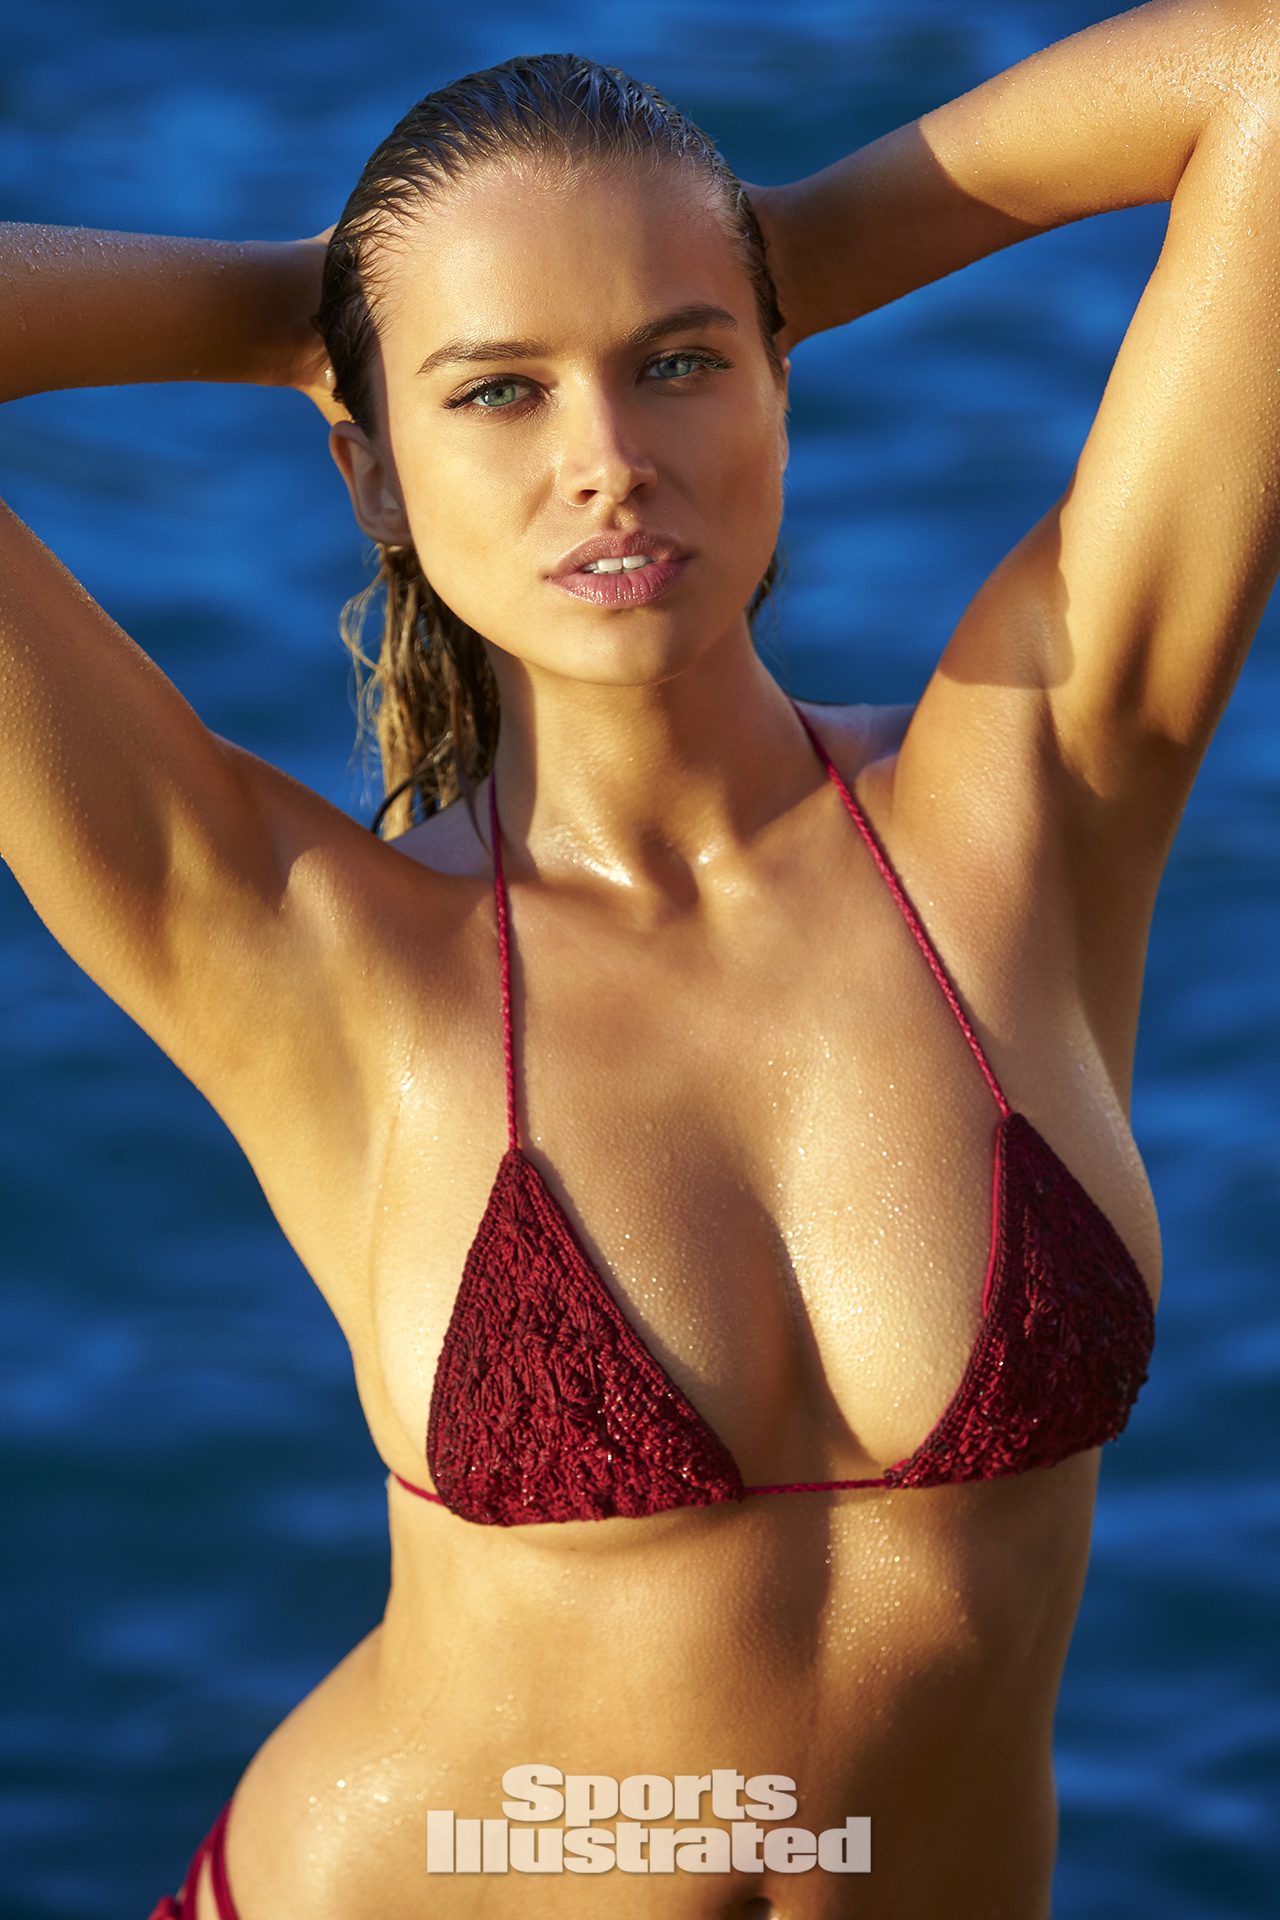 Photos Tanya Mityushina nudes (77 foto and video), Sexy, Hot, Boobs, underwear 2020